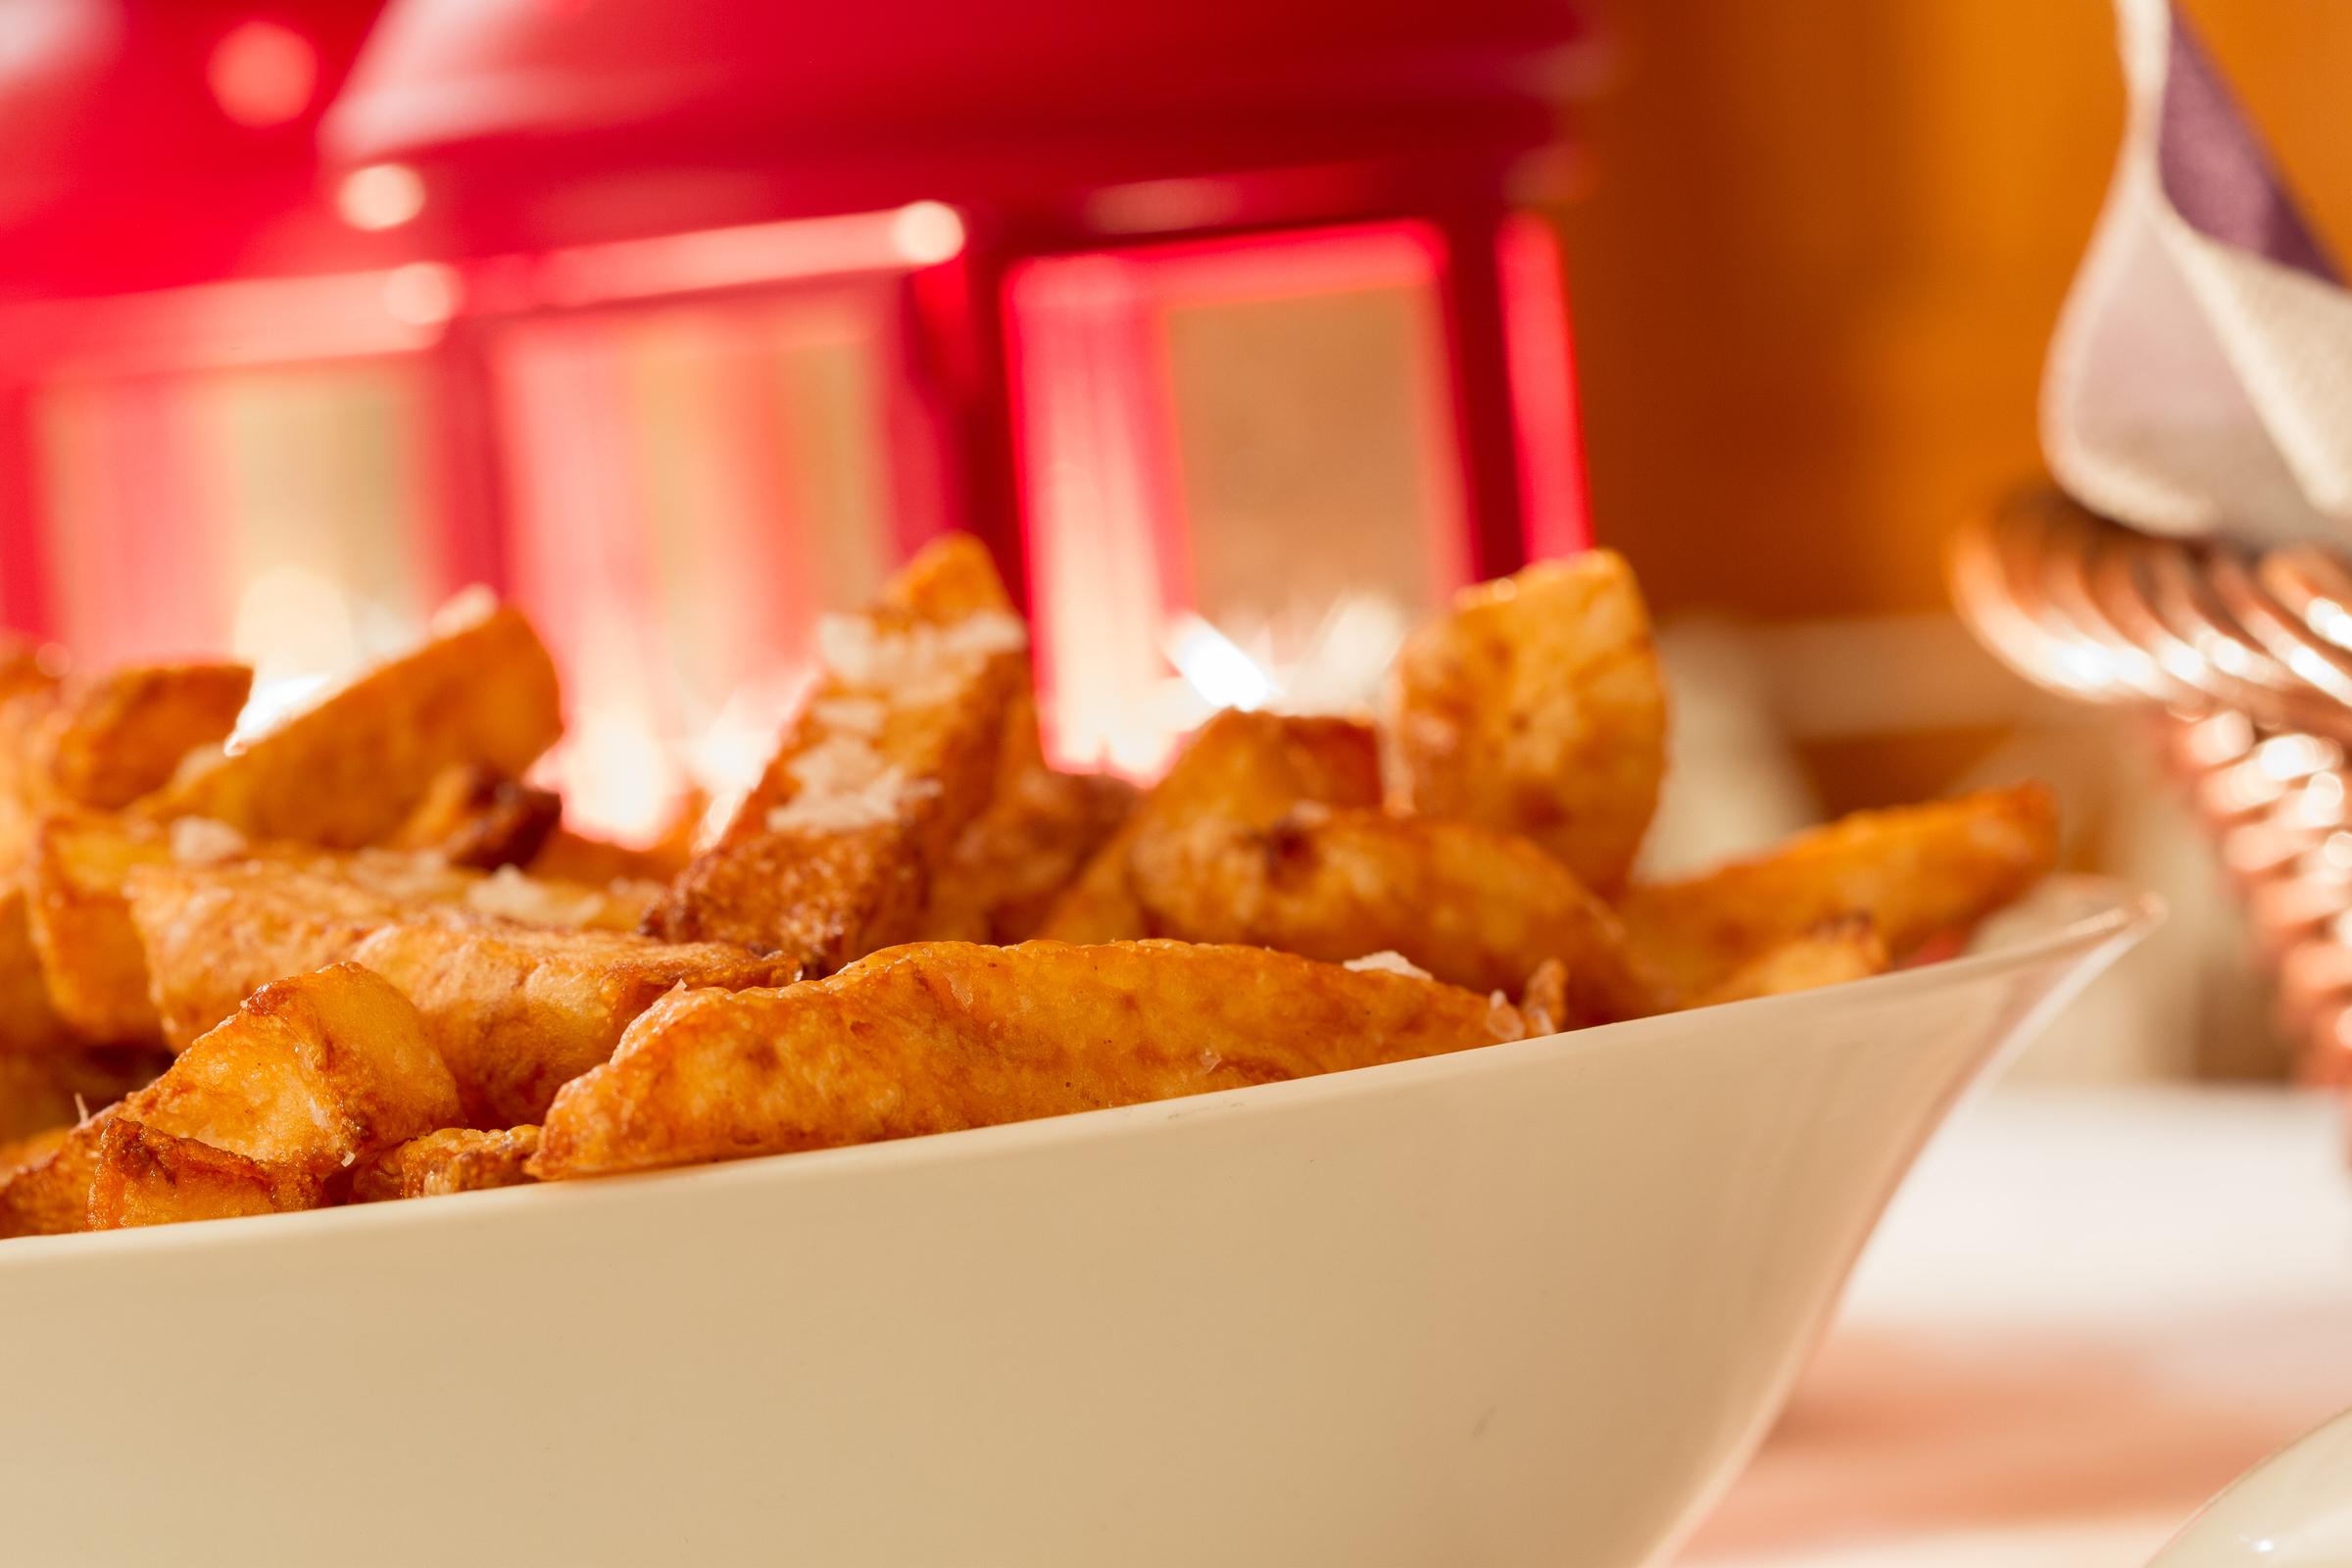 Trippel Fried Fries